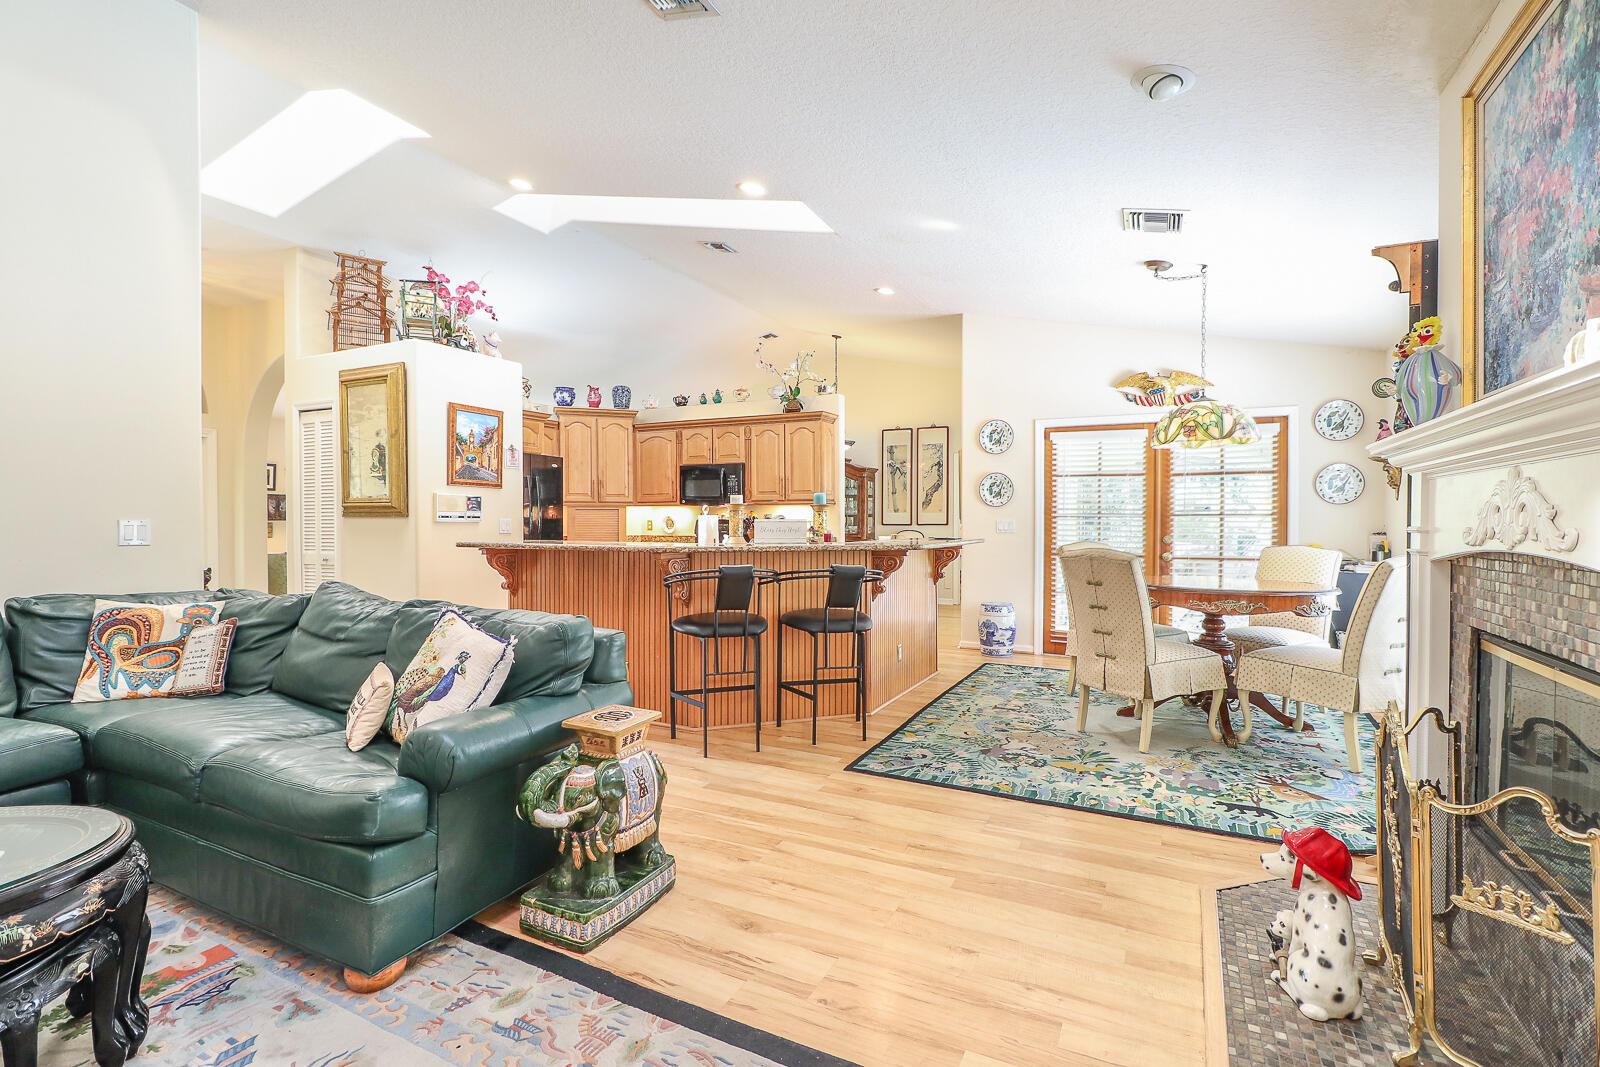 28-Family Room